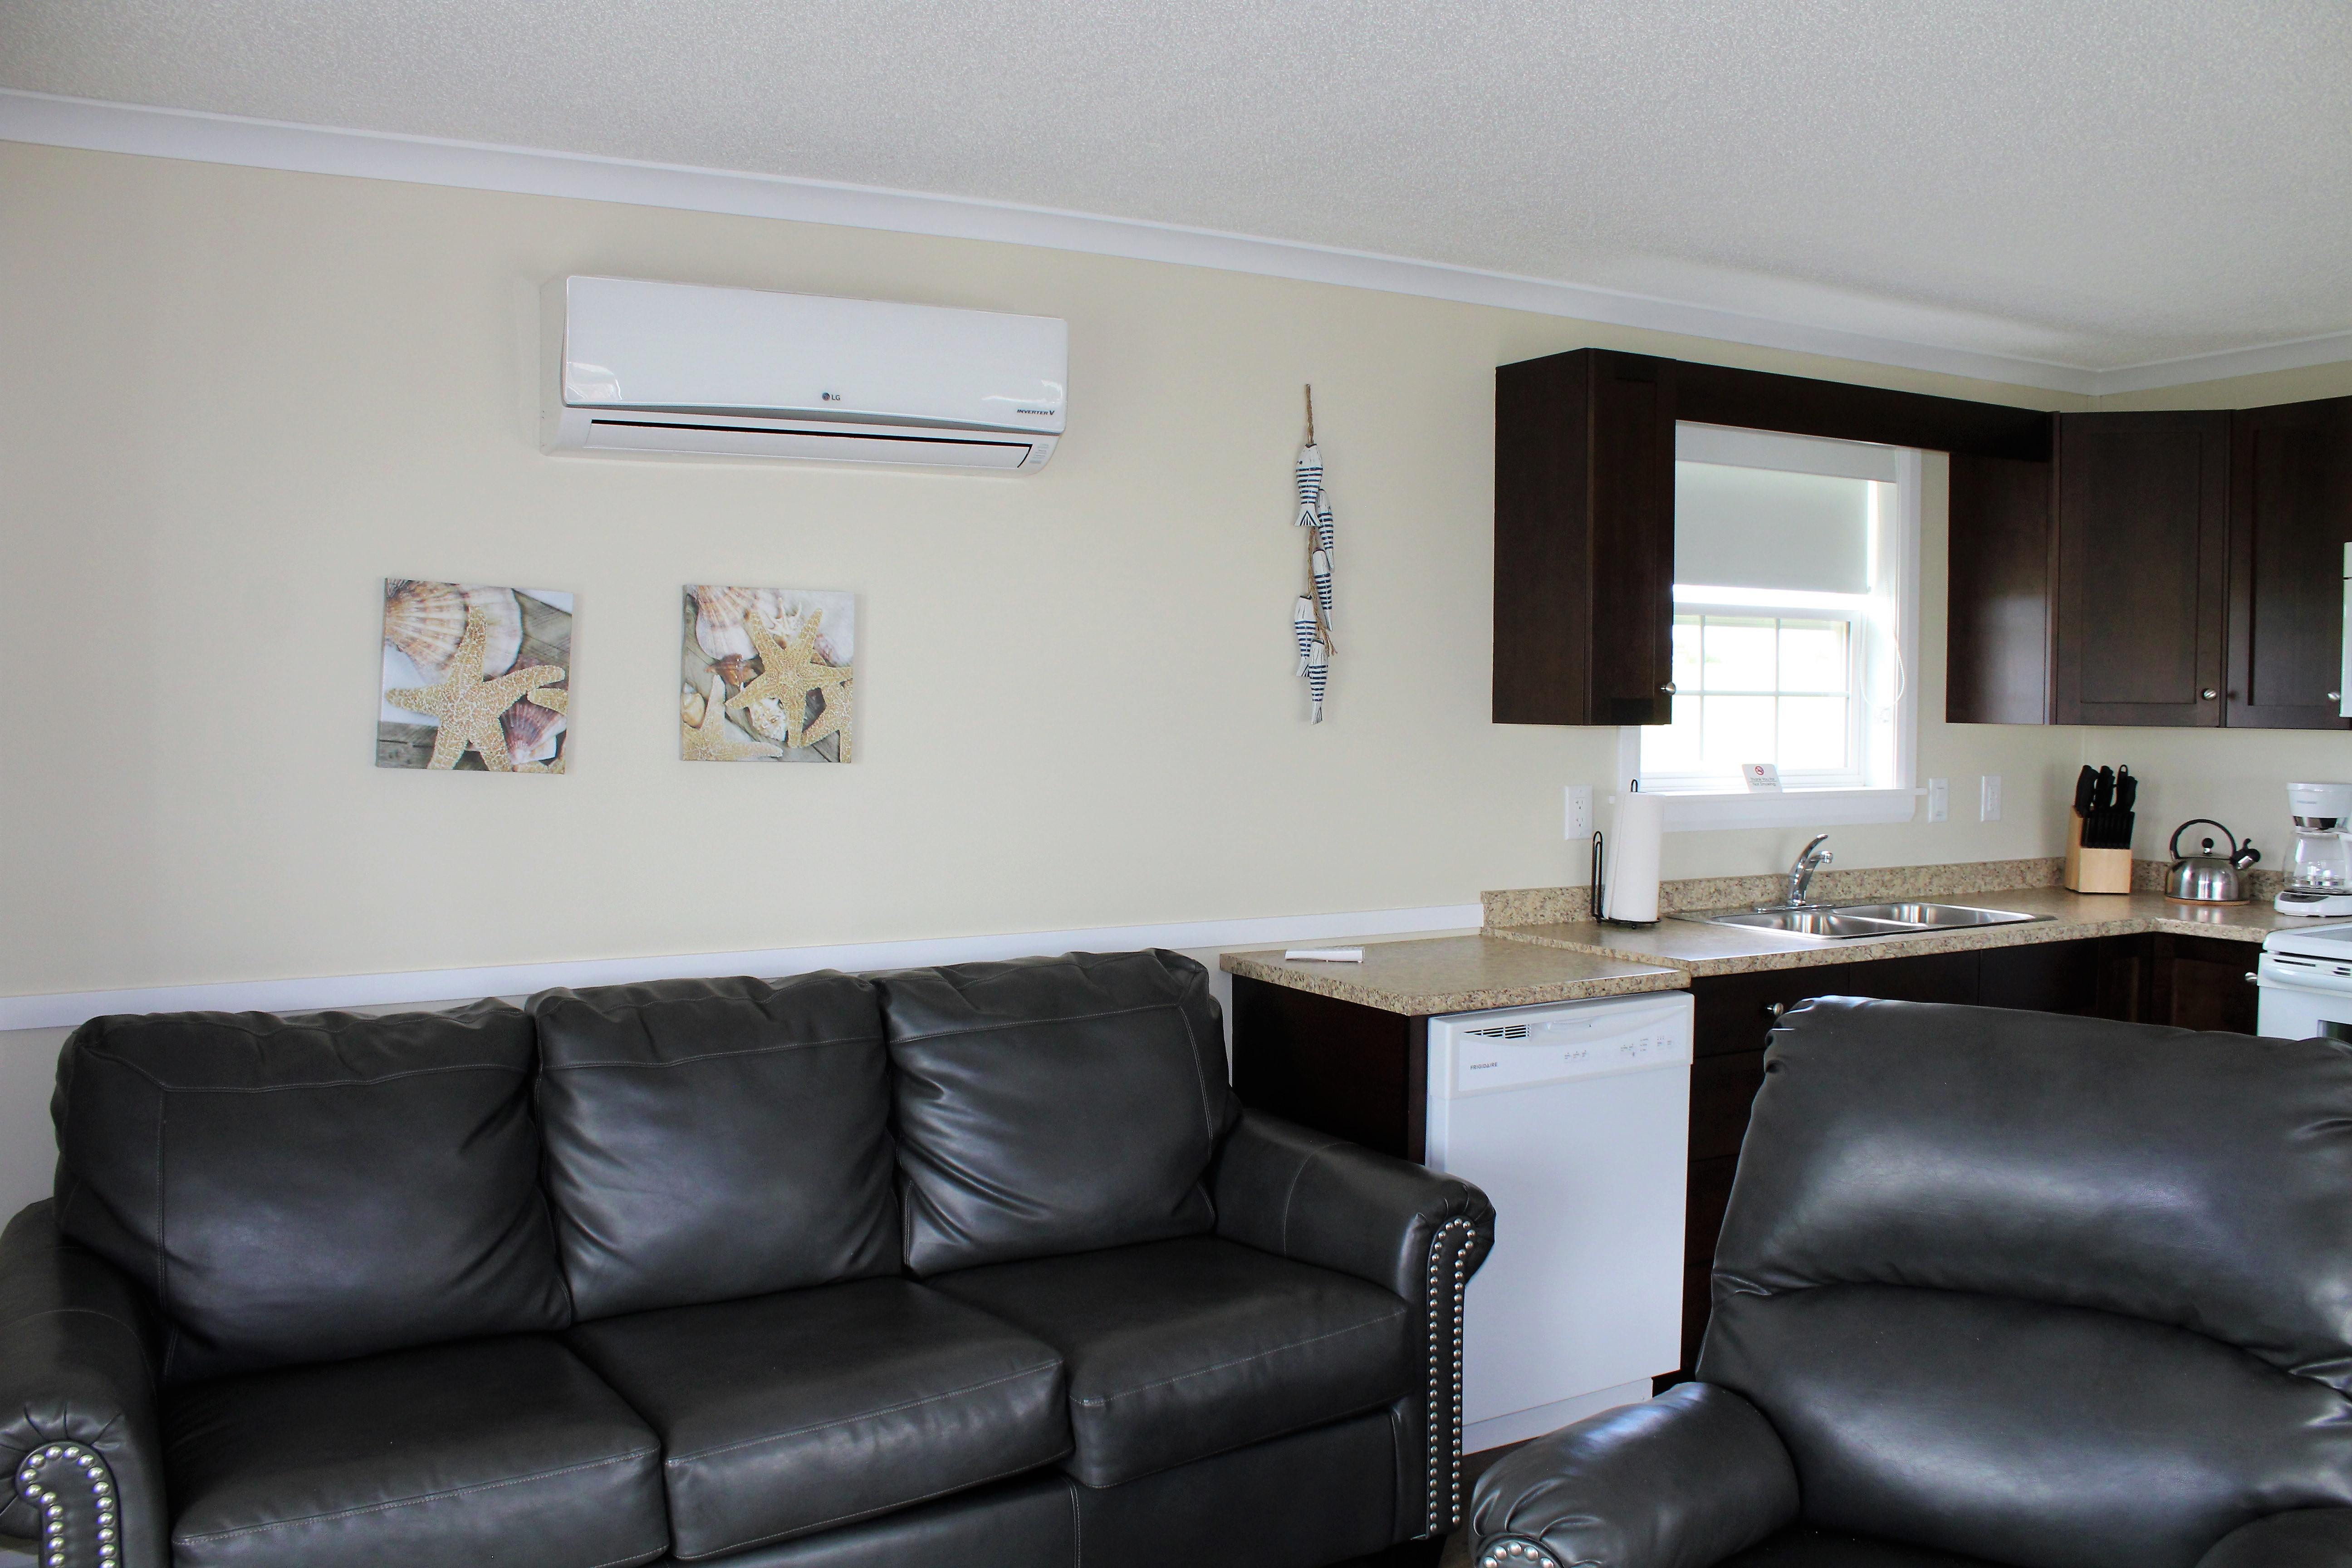 PM #4 Living Room/Kitchen